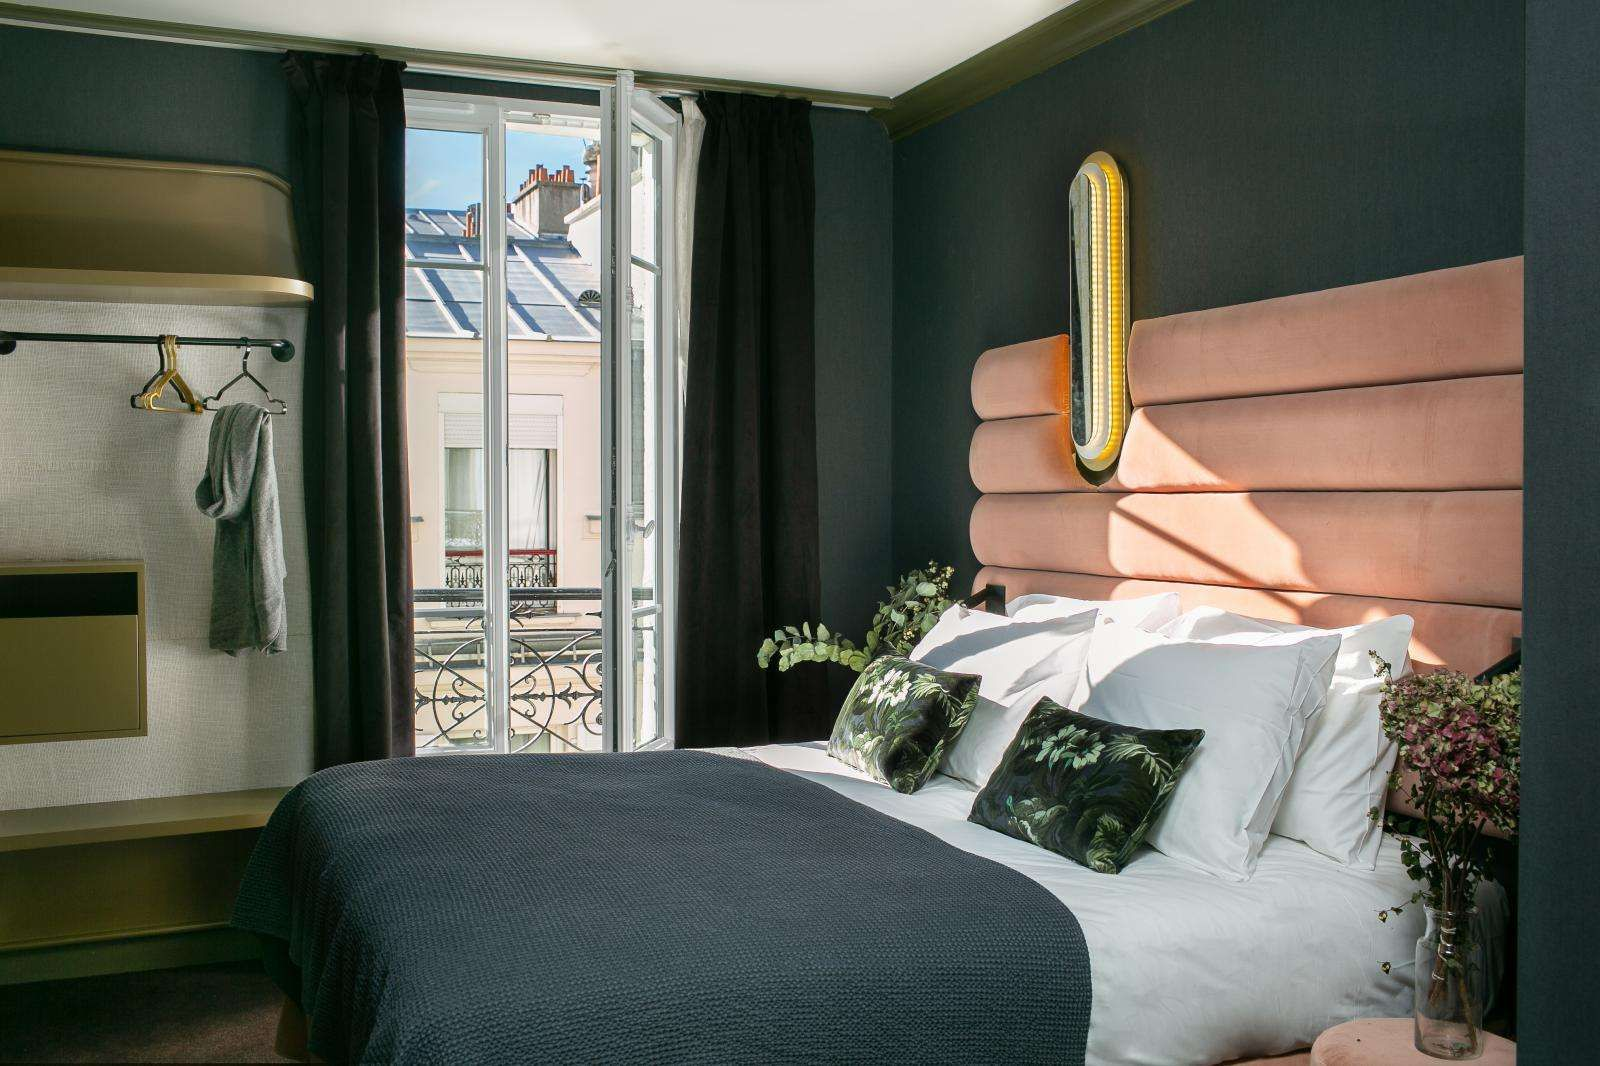 la planque hotel bed room in 2019 paris hotels hotel lobby design rh pinterest com